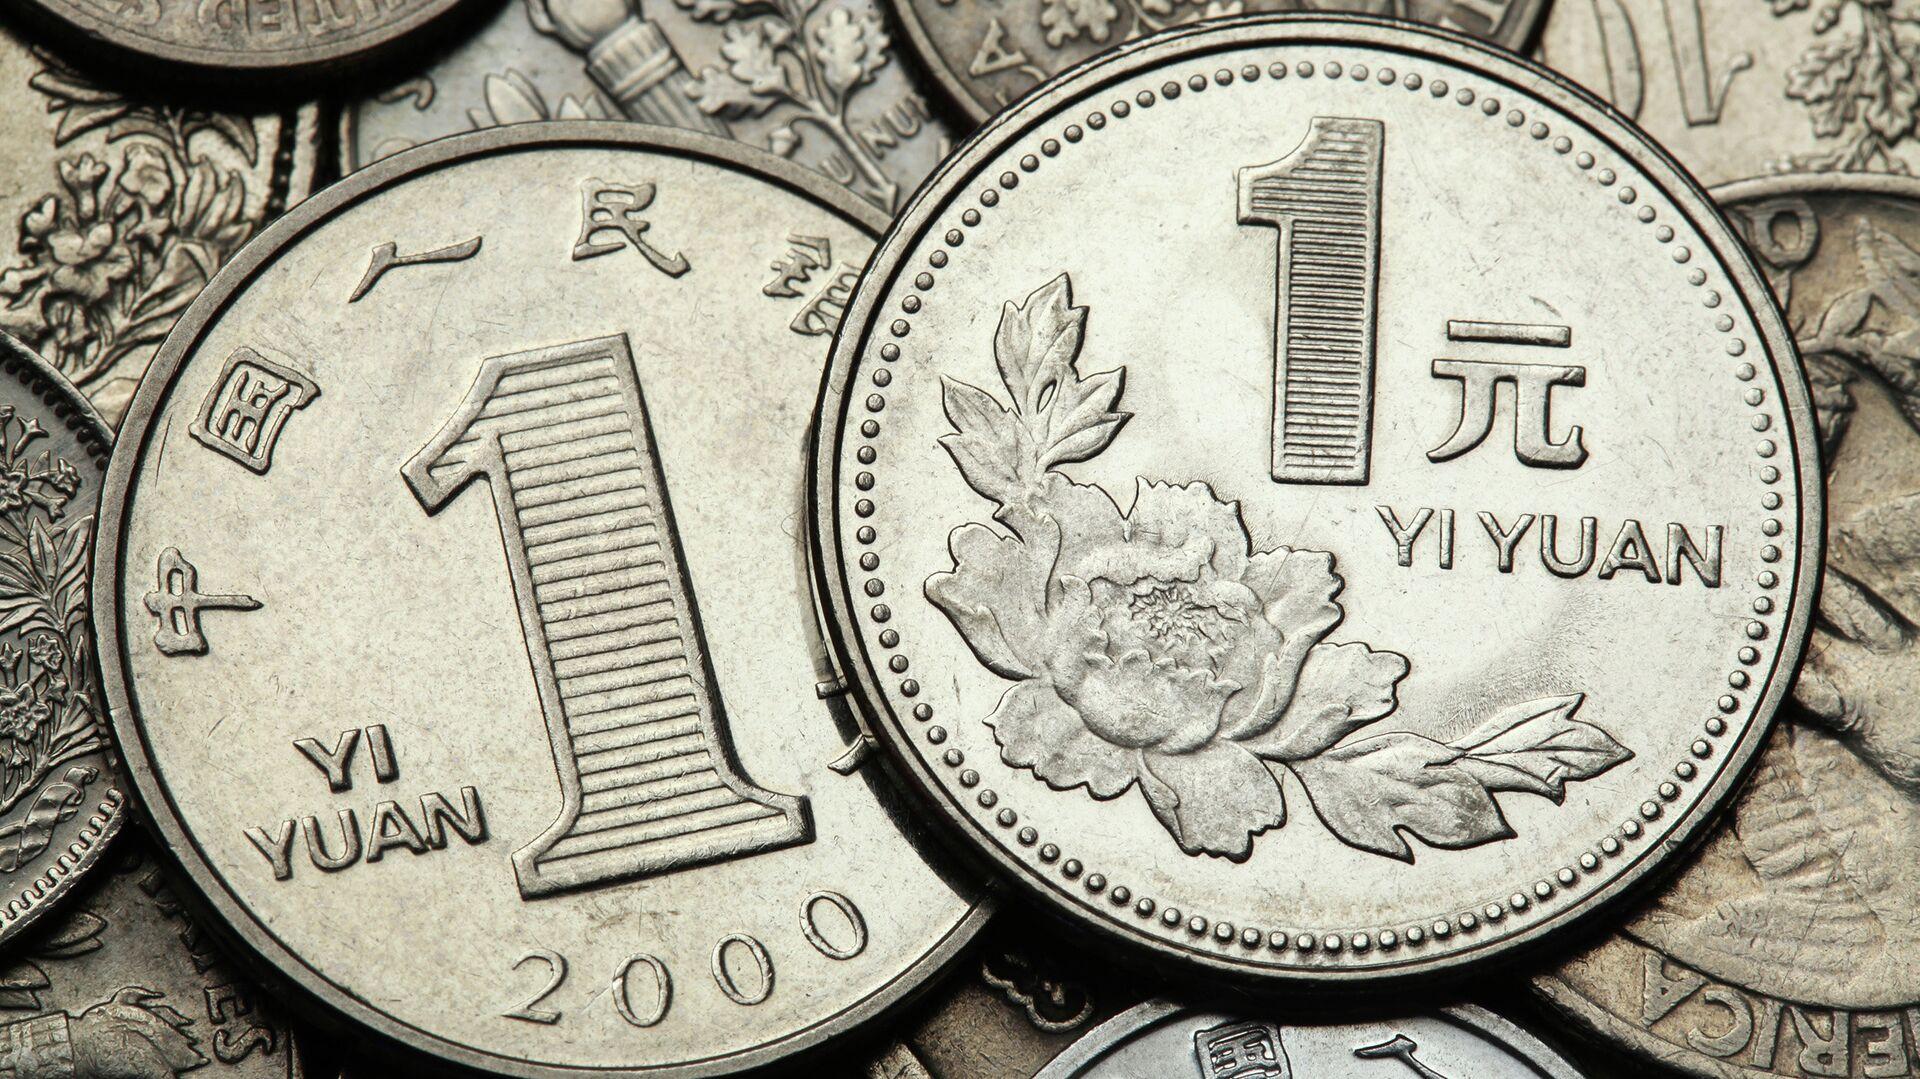 Монеты в 1 юань - РИА Новости, 1920, 02.04.2021